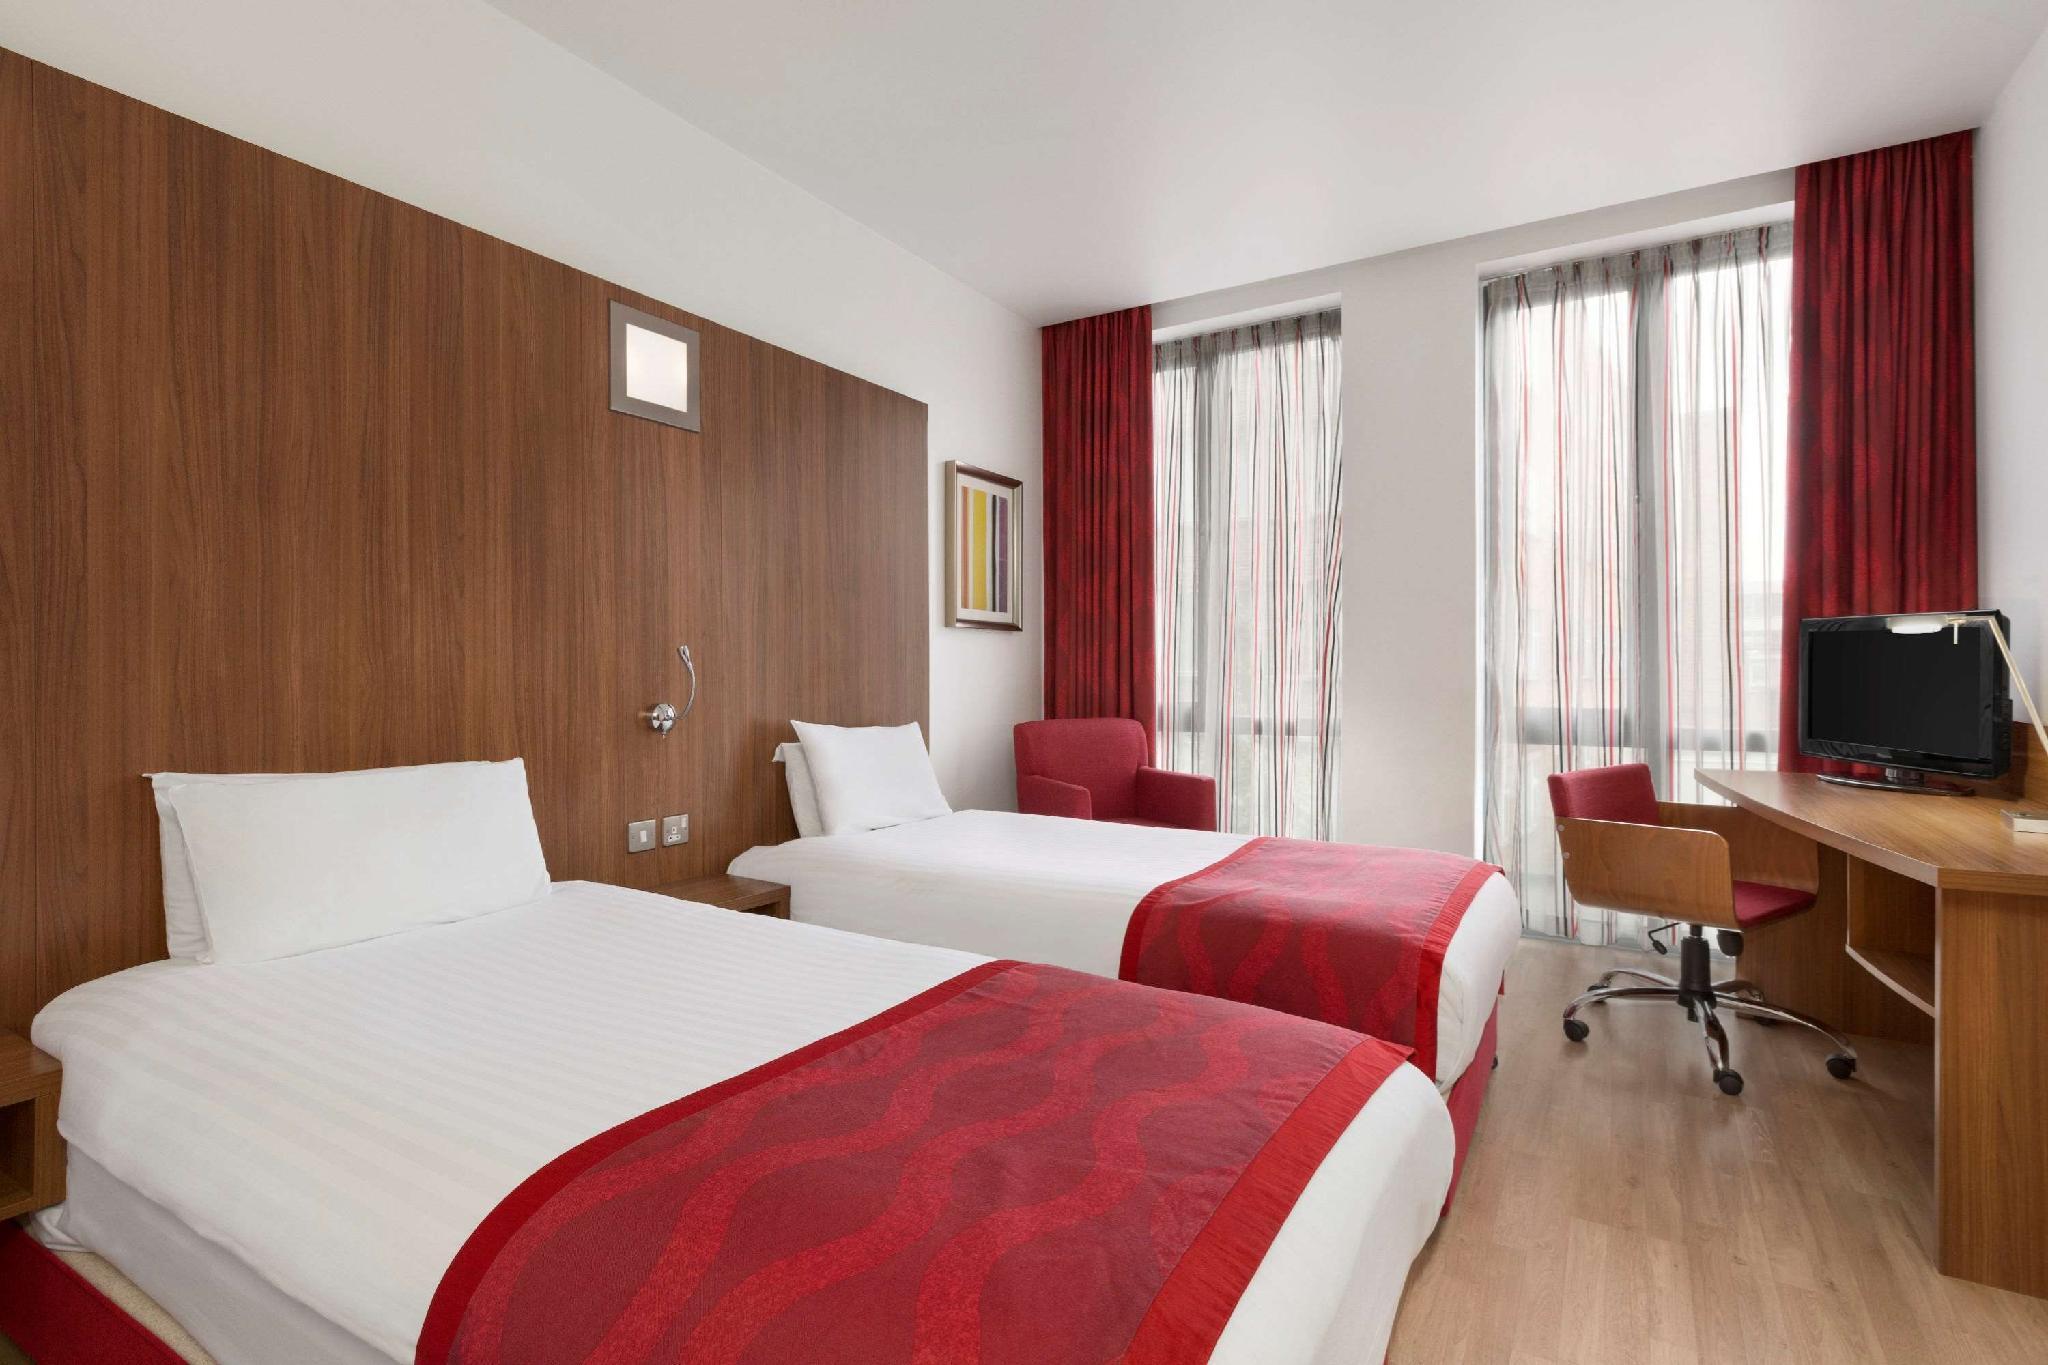 Ramada Encore By Wyndham Leicester City Centre Hotel Deals Photos Reviews